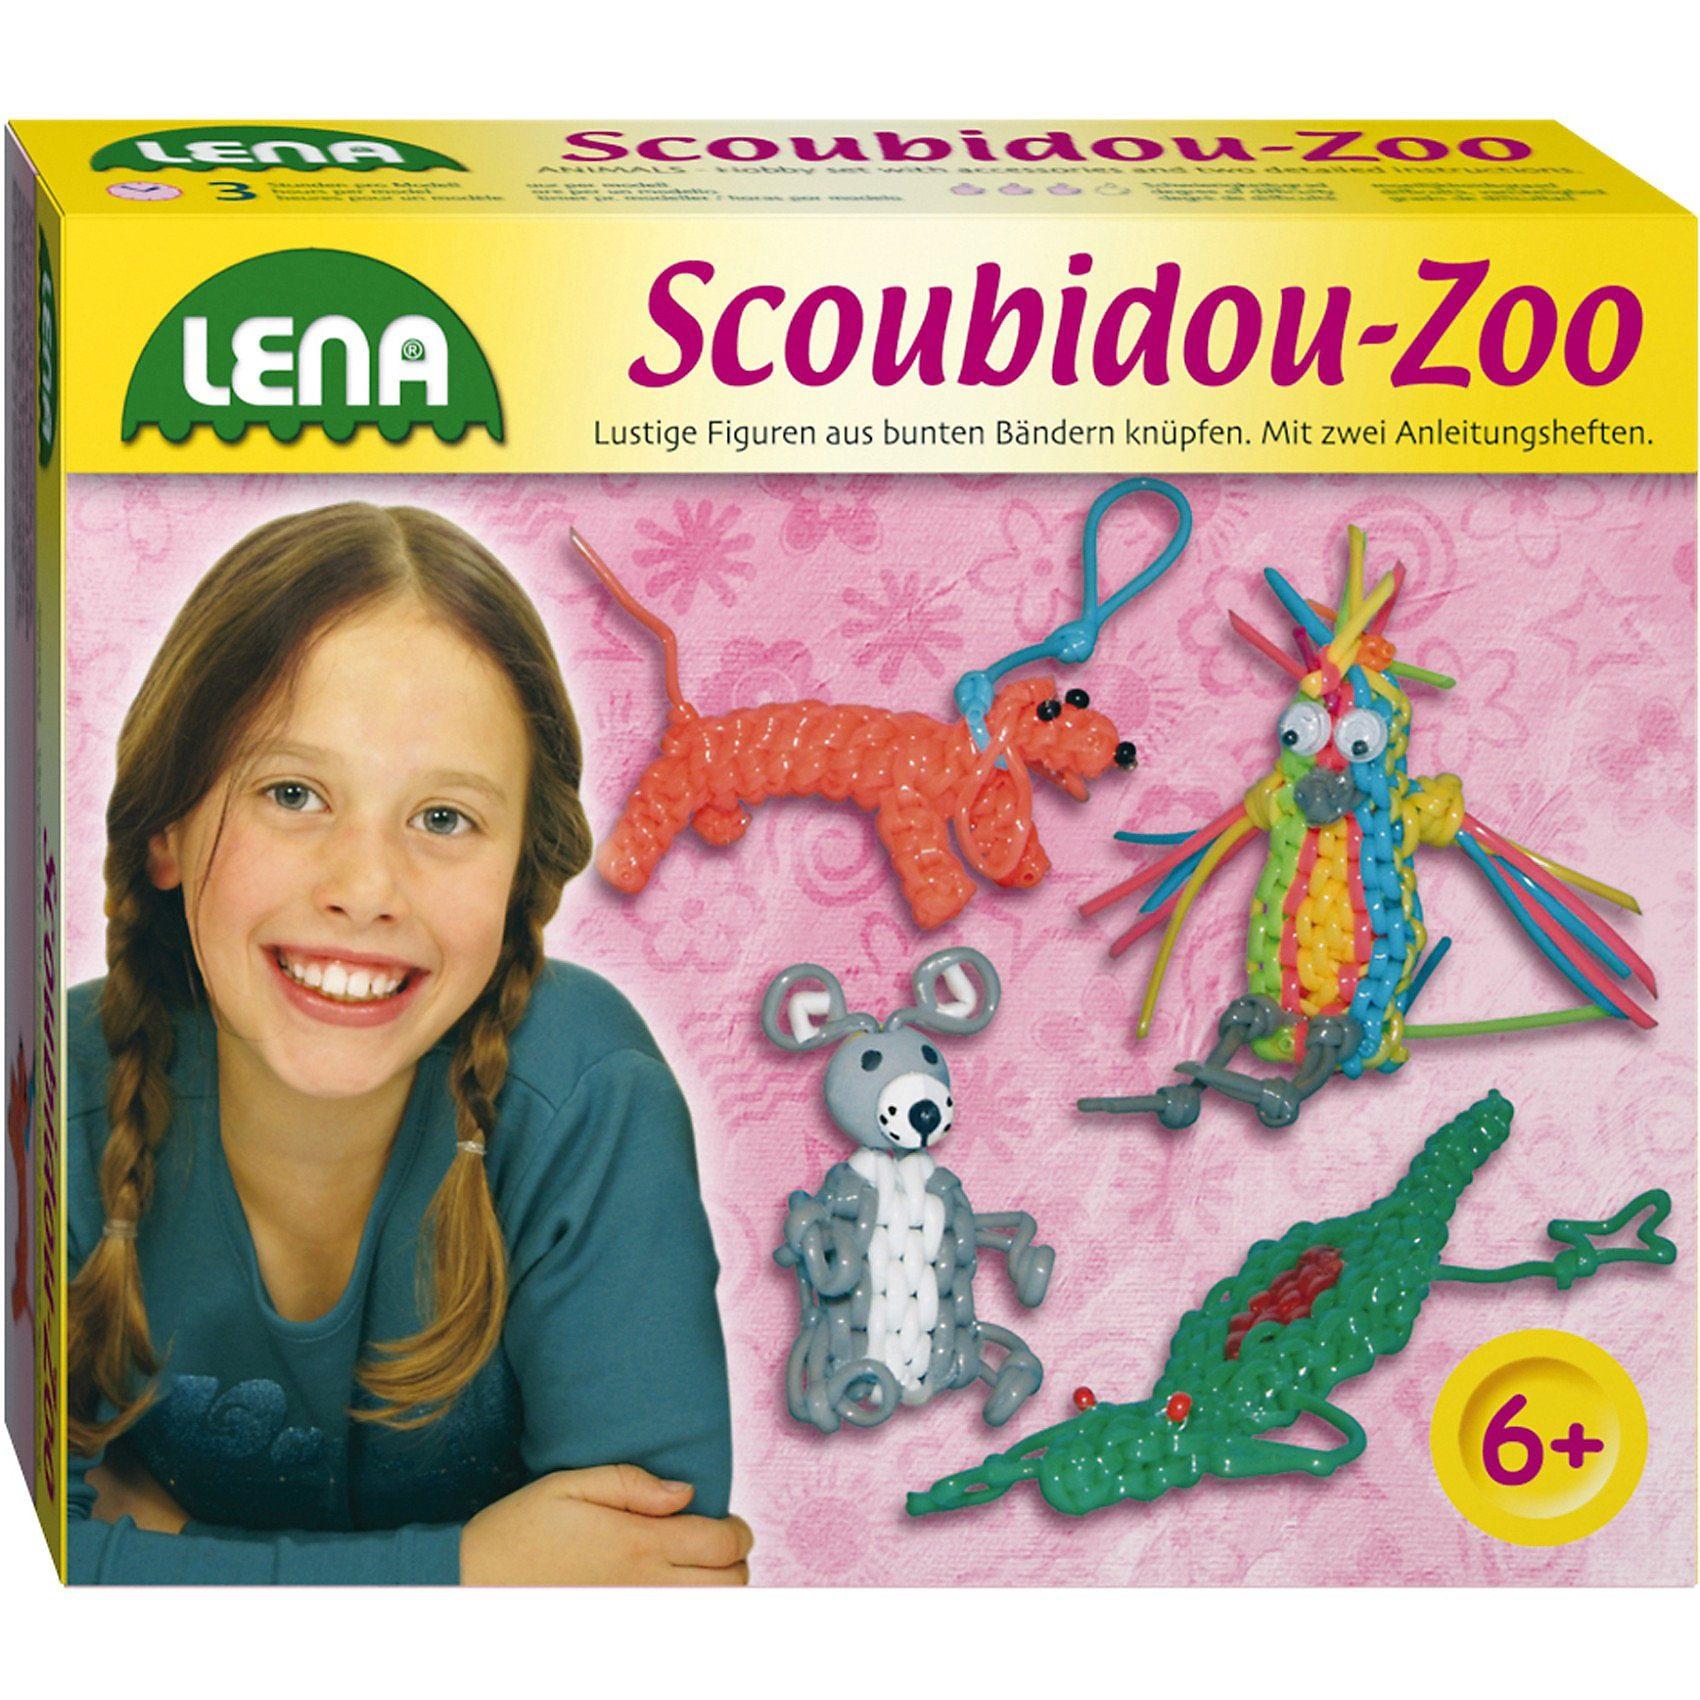 LENA Scoubidou-Zoo